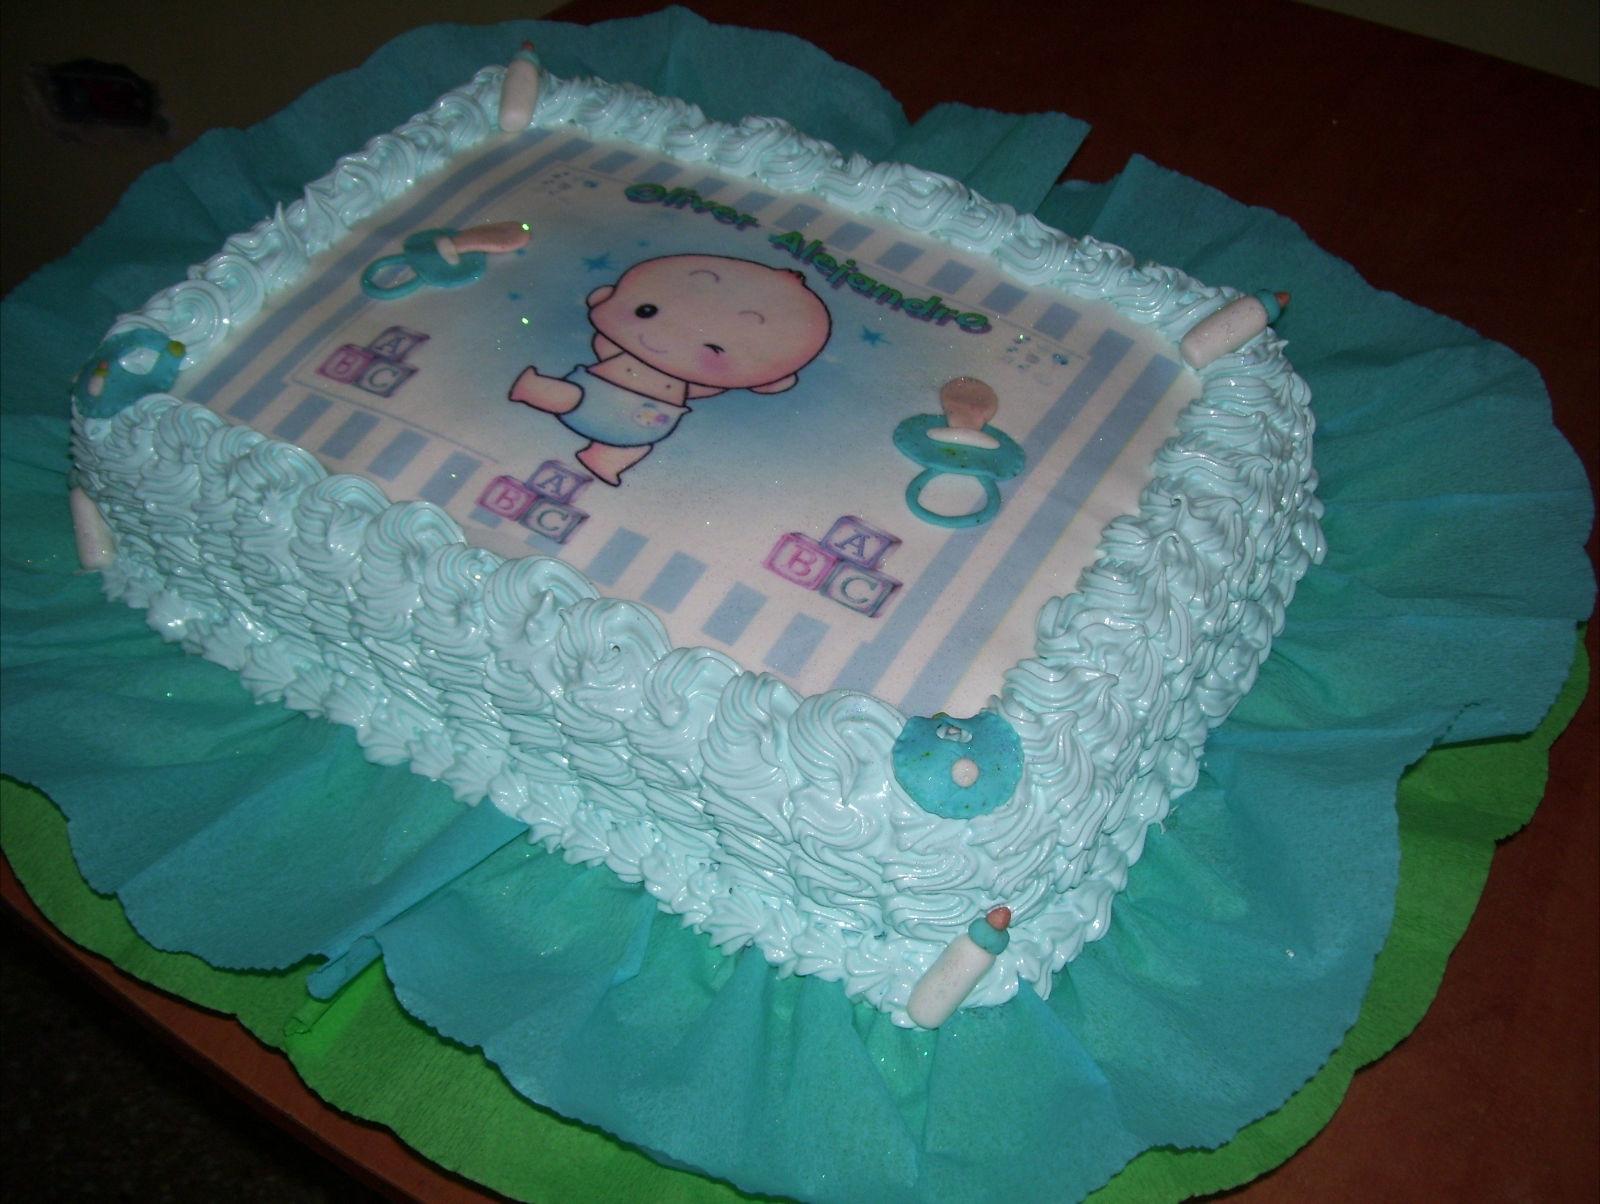 Full Rumbitas Baby Shower: TORTAS Y GELATINAS DECORADAS